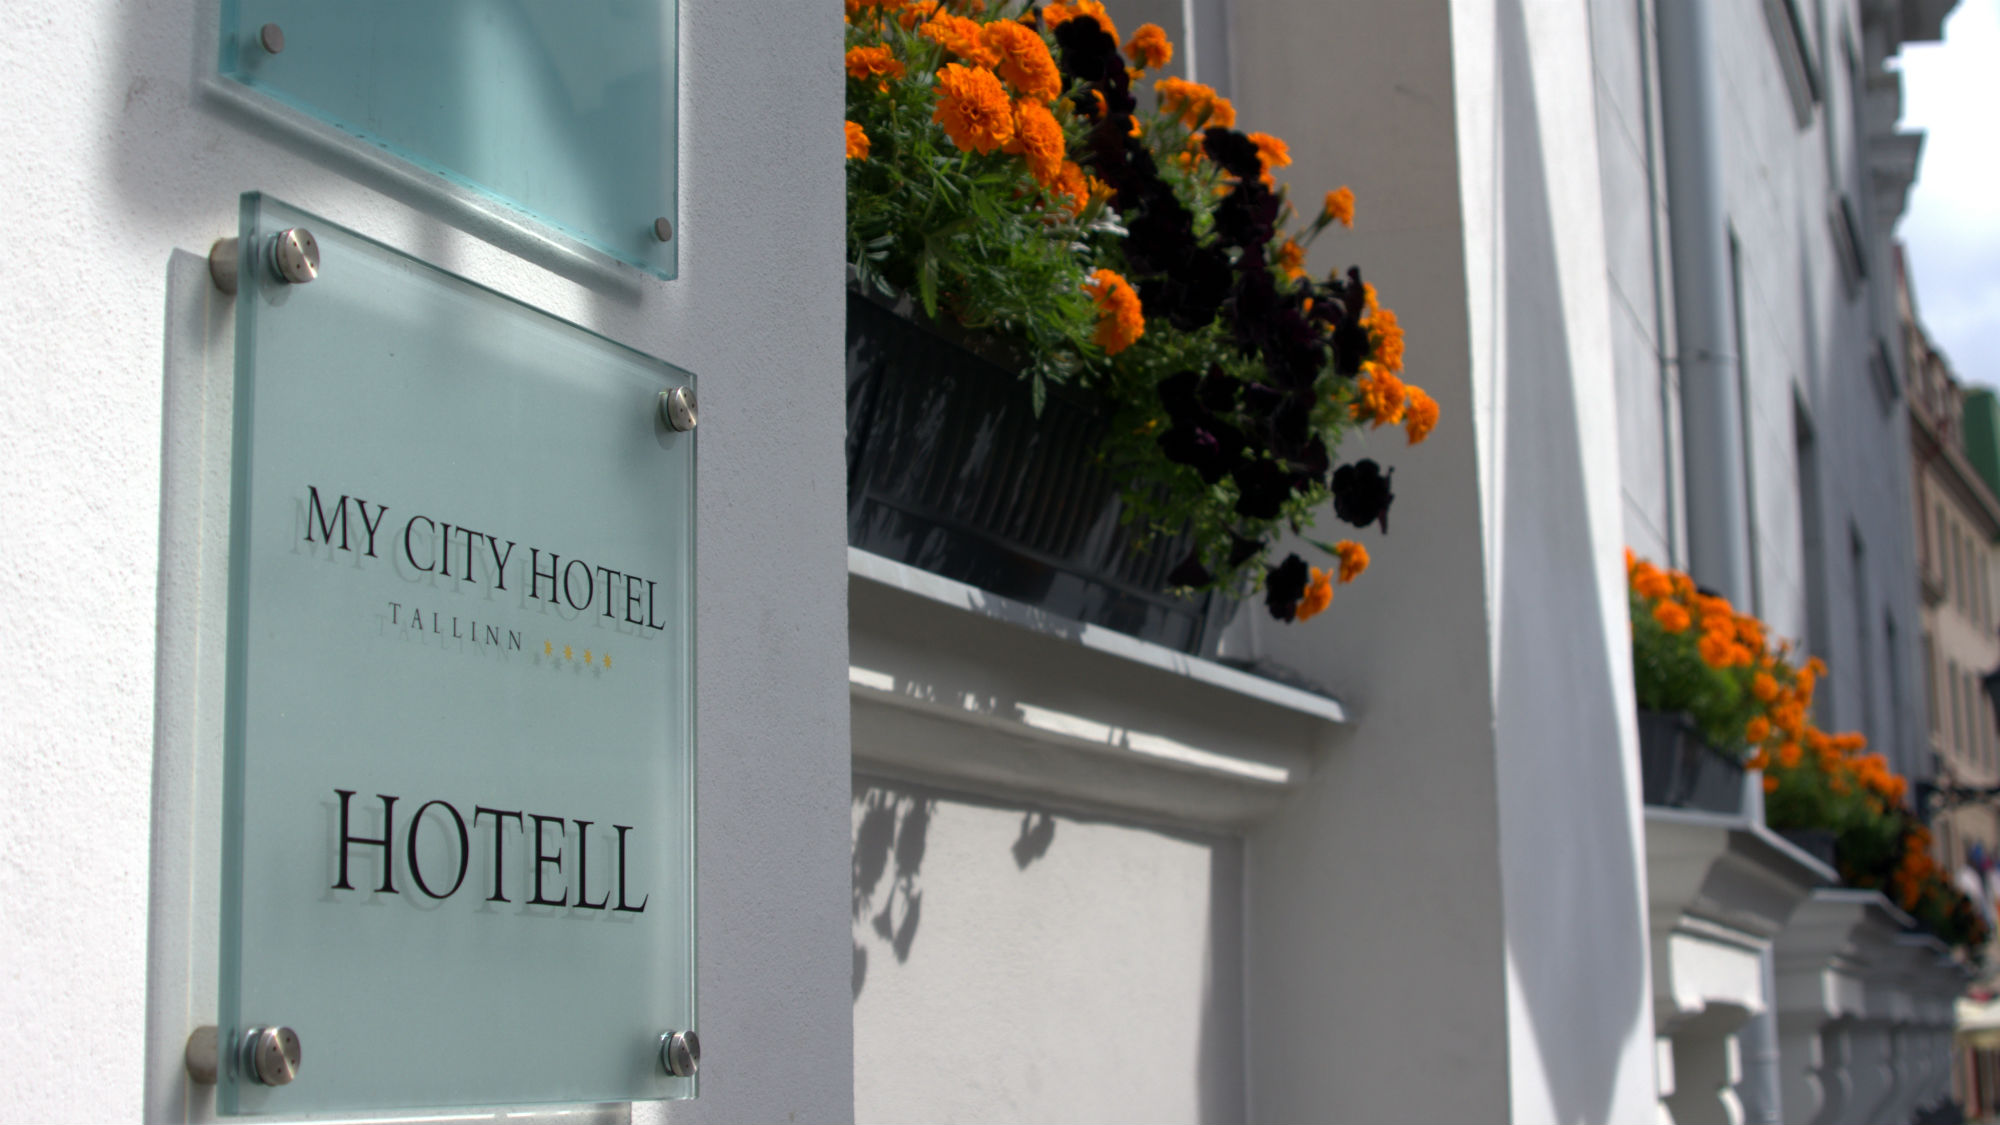 2000X1125_Hotel_MyCity_in_Tallinn_facade1